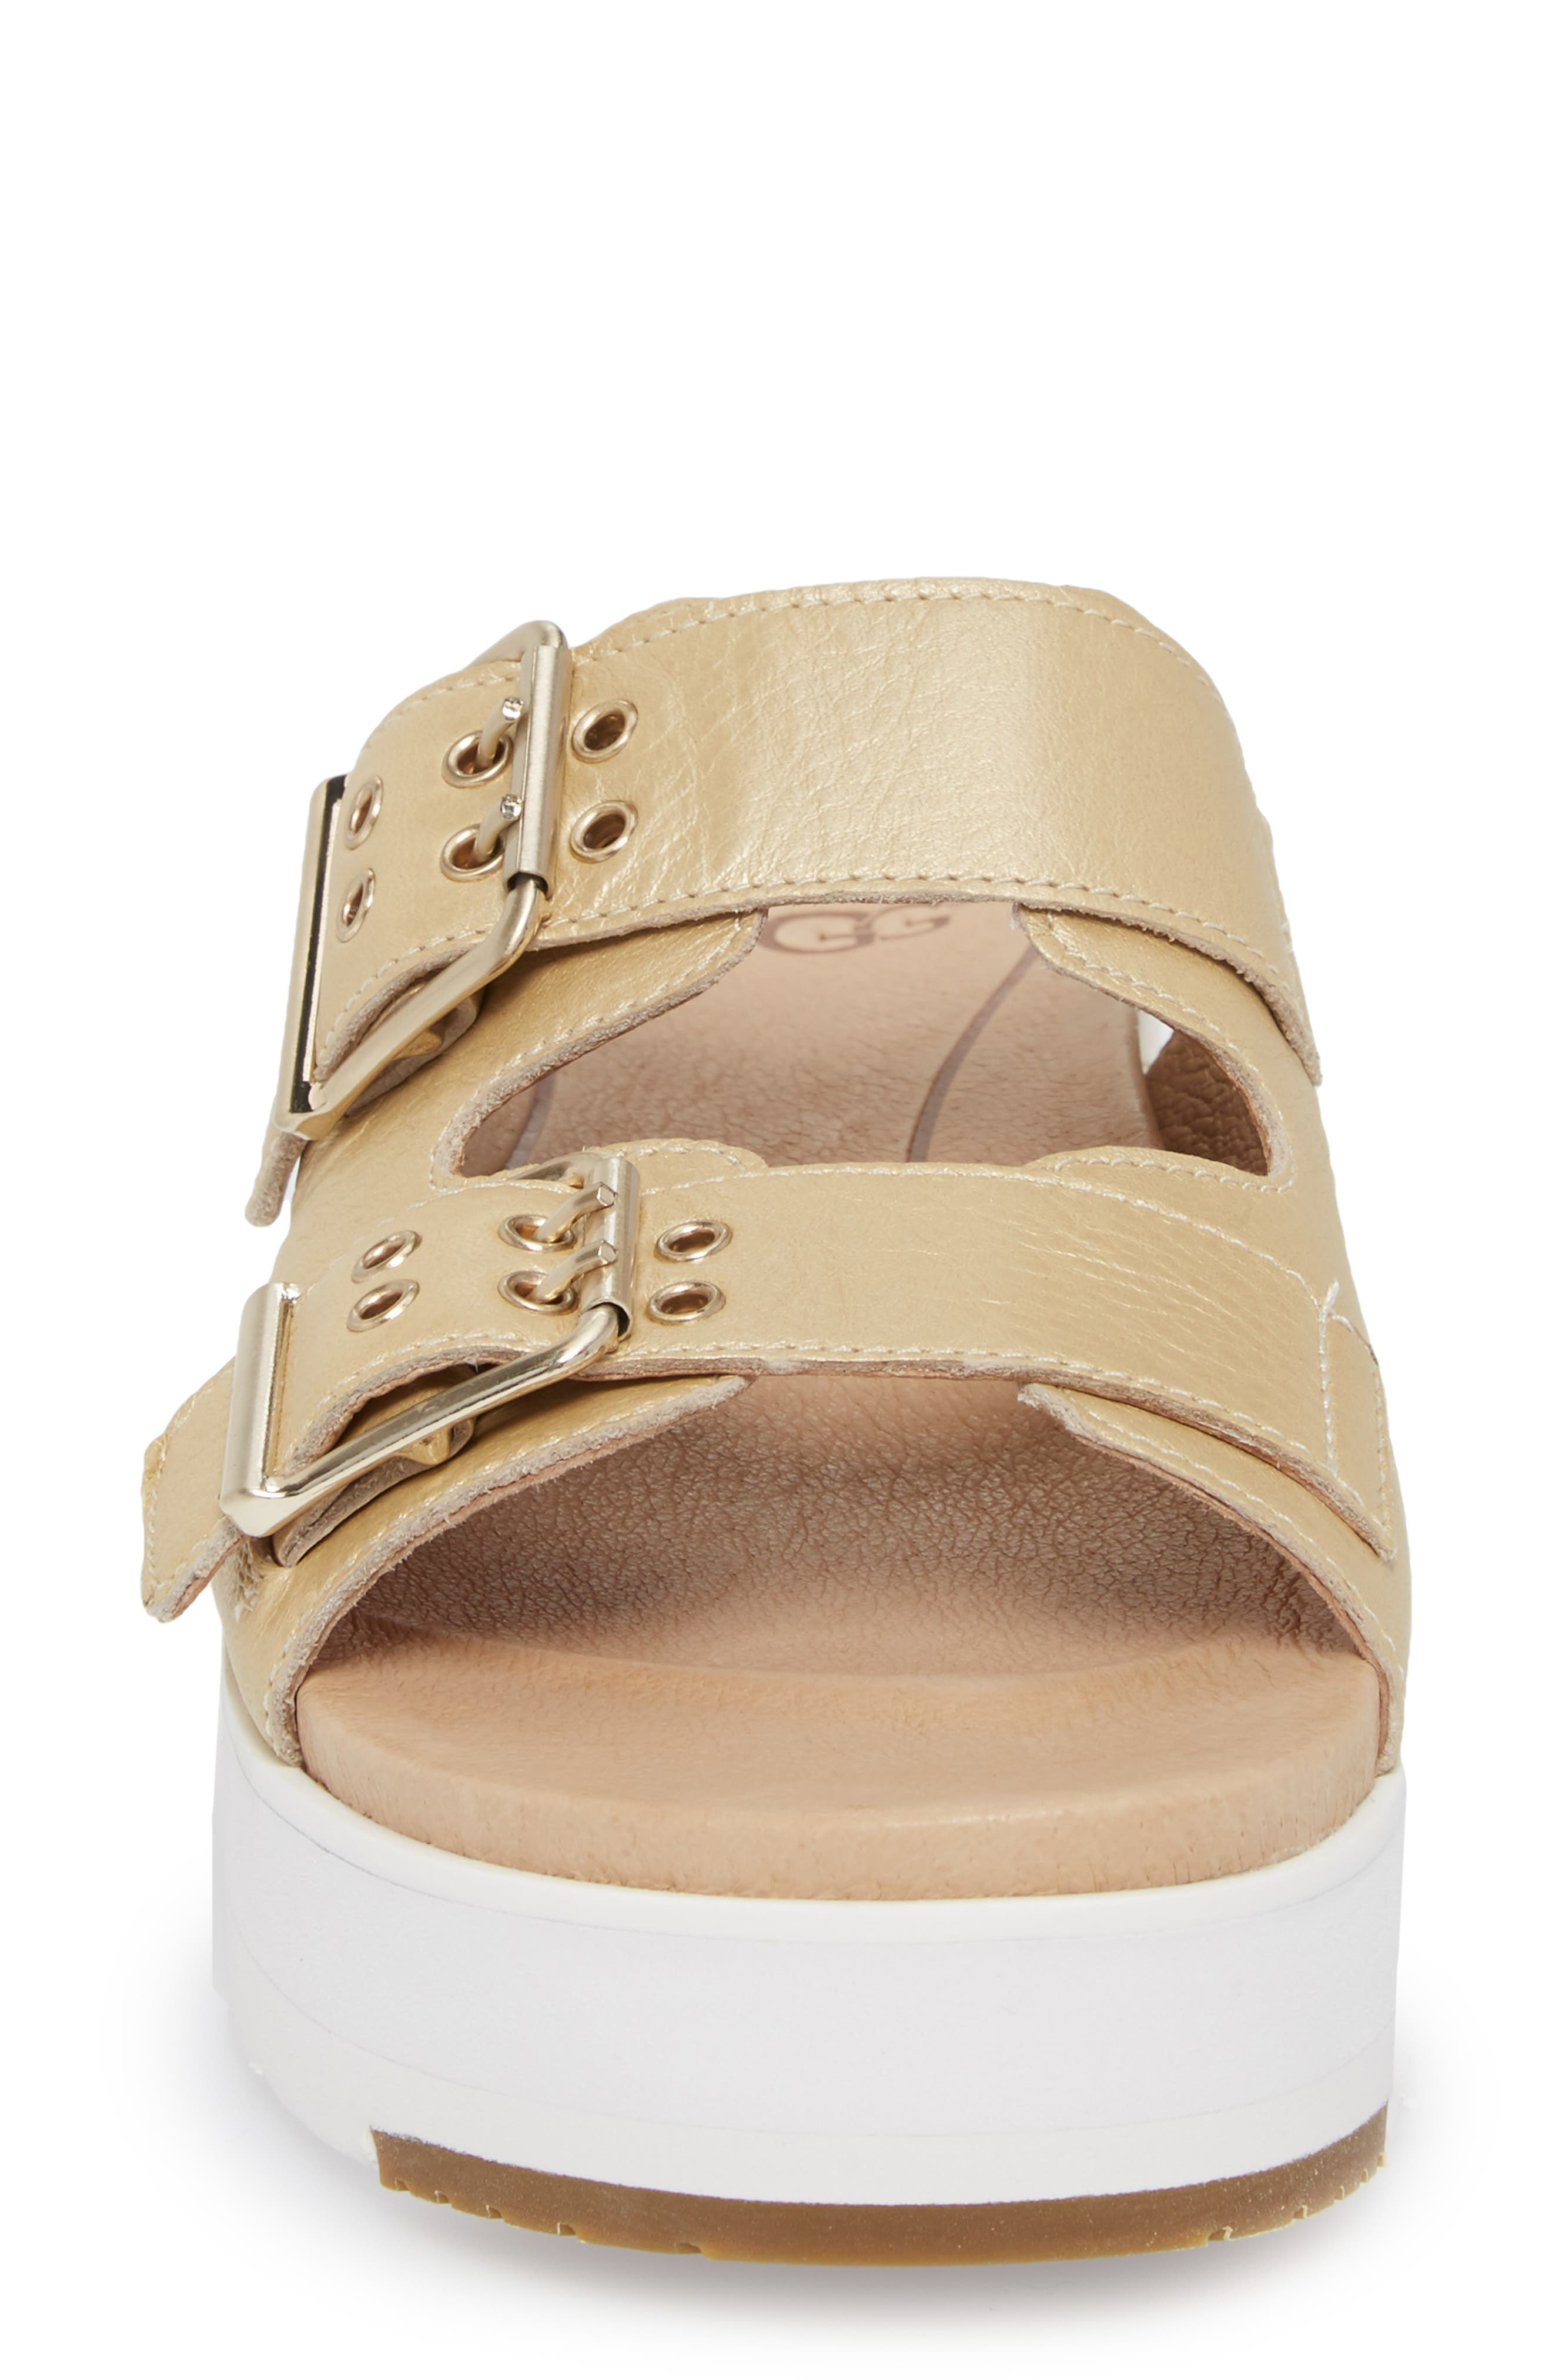 Cammie Platform Sandal,                             Alternate thumbnail 4, color,                             Gold Patent Leather